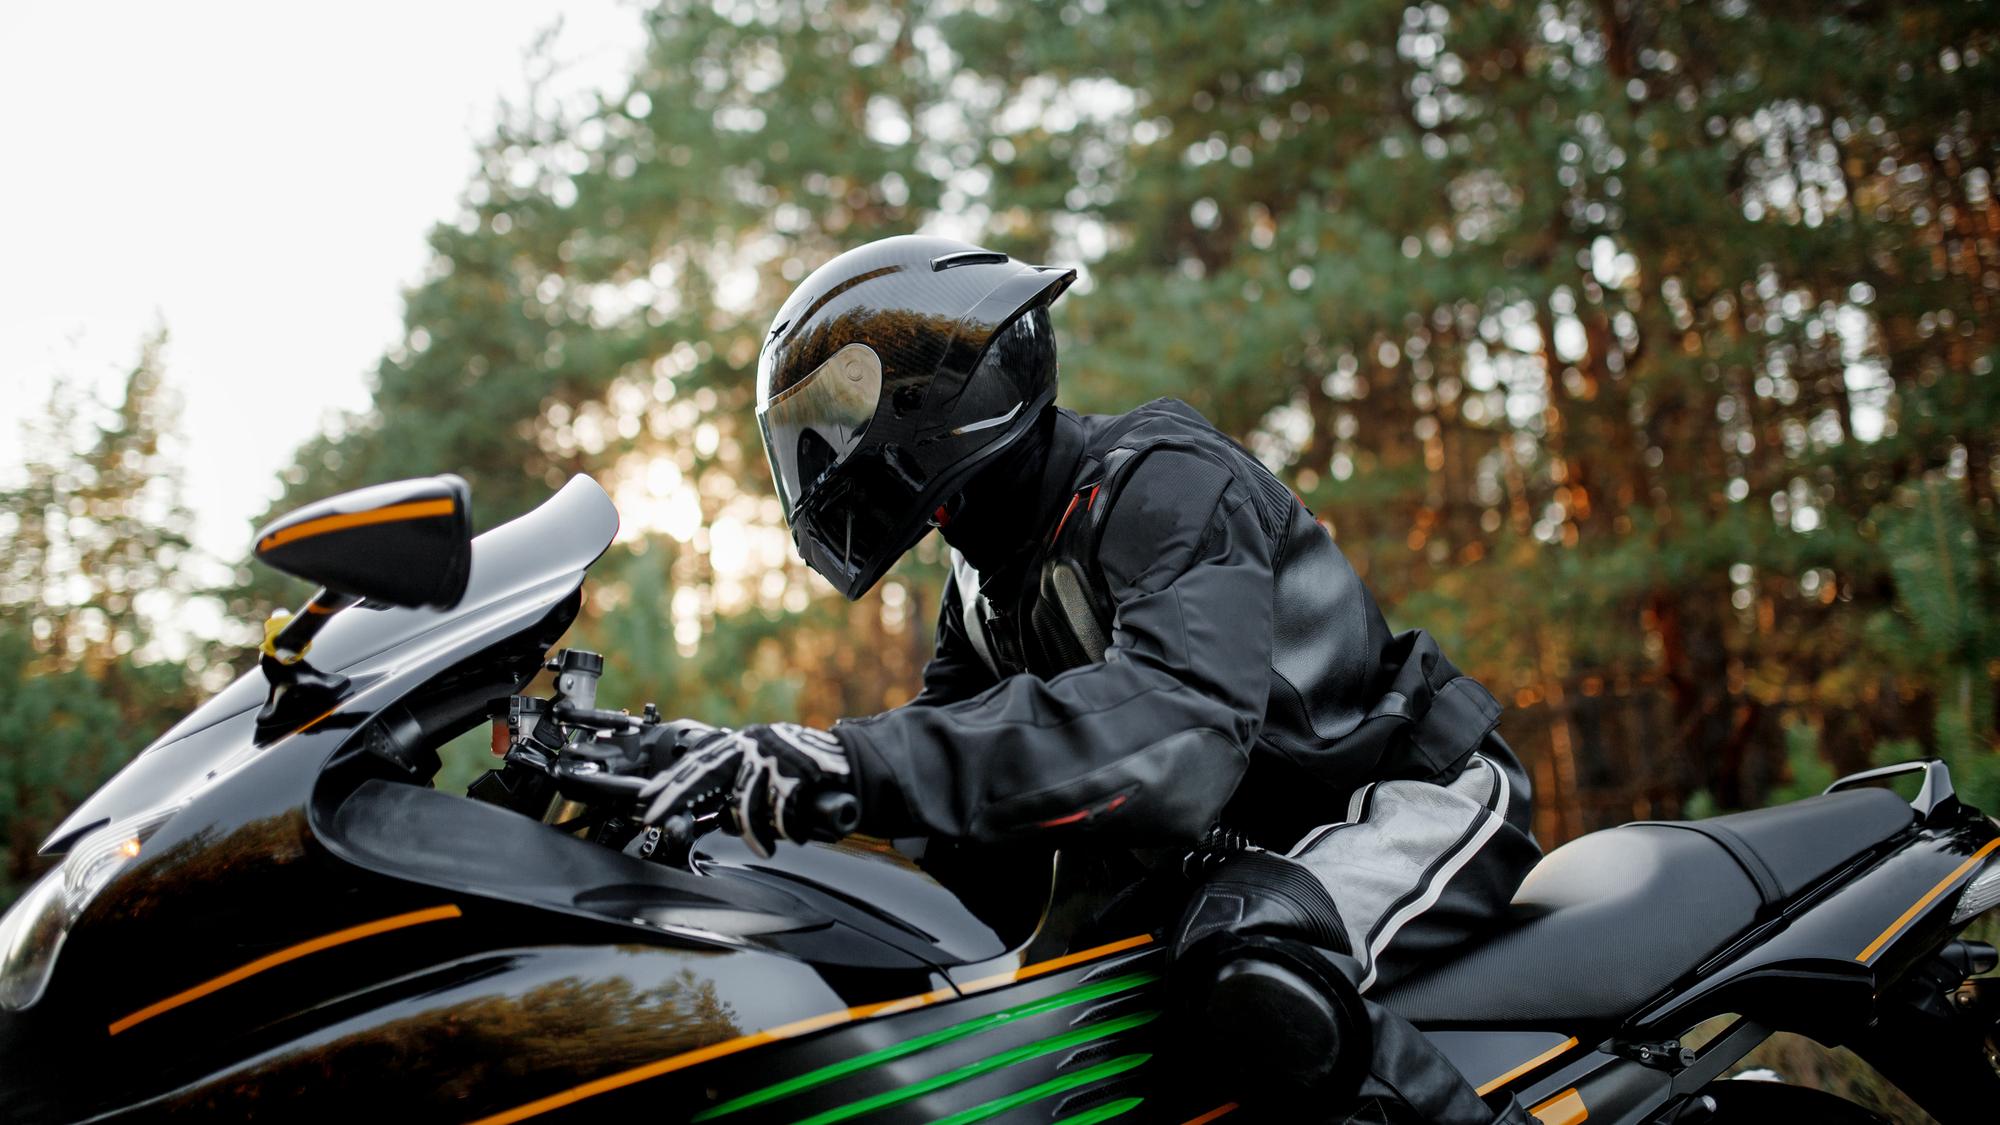 Motocyklista na motorke s prilbou a kvalitnou bundou